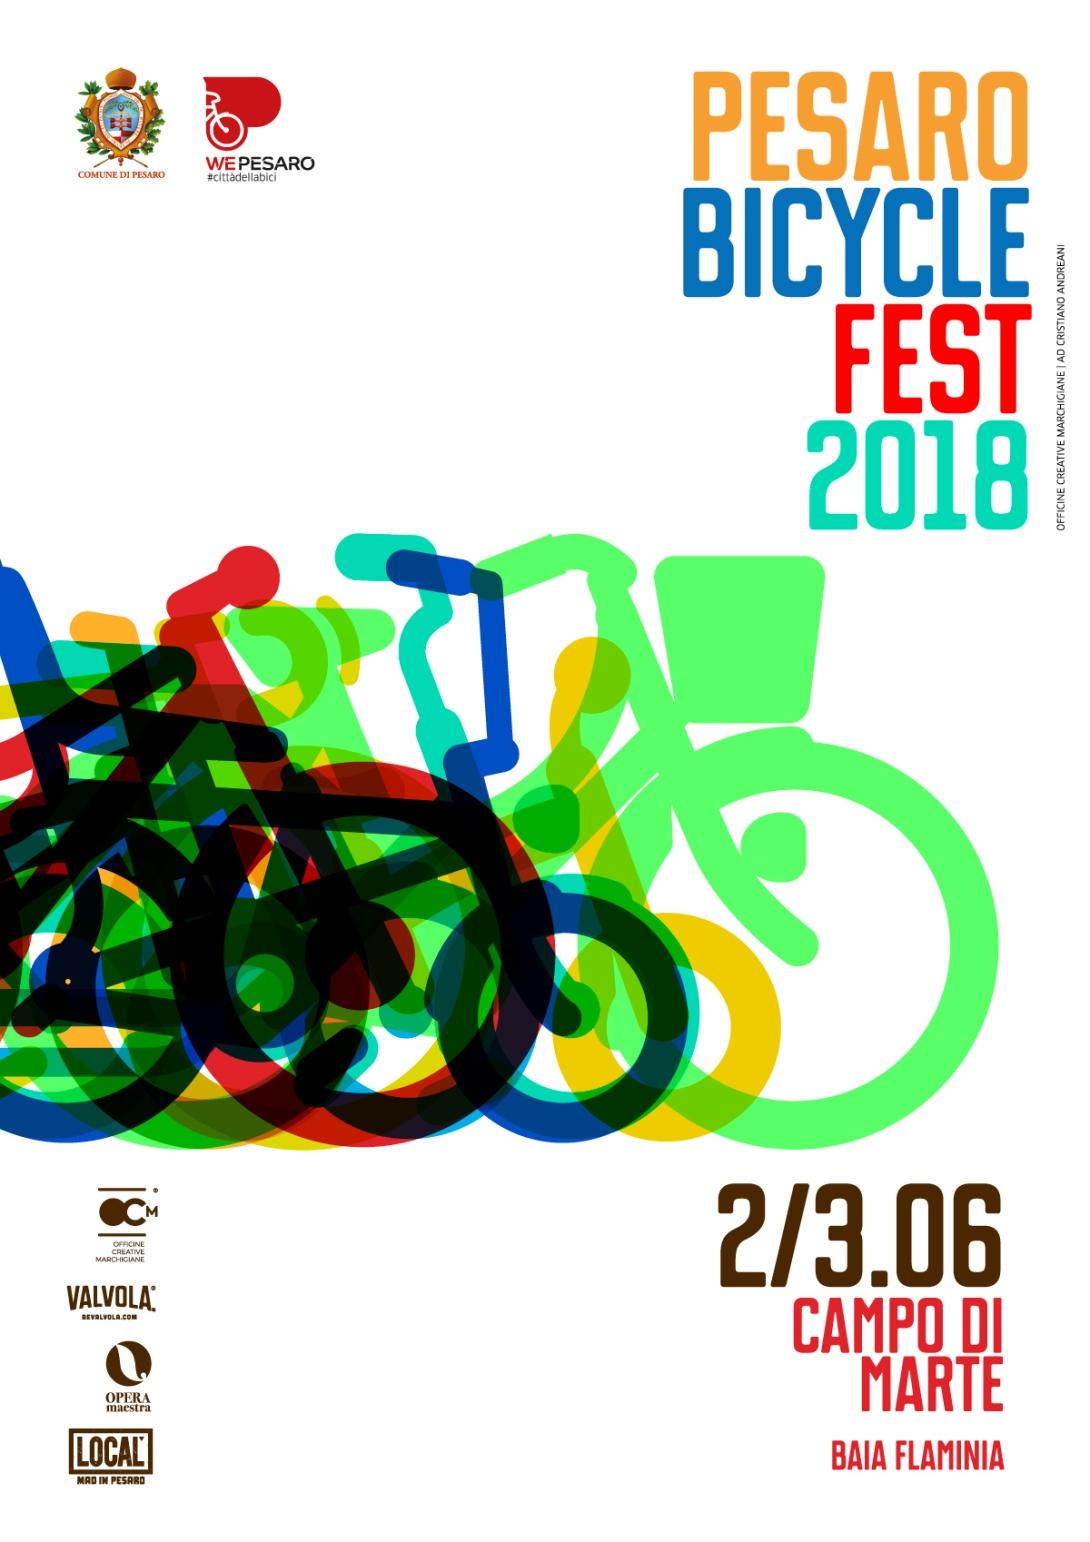 Pesaro-Bicycle-Fest-comunicato